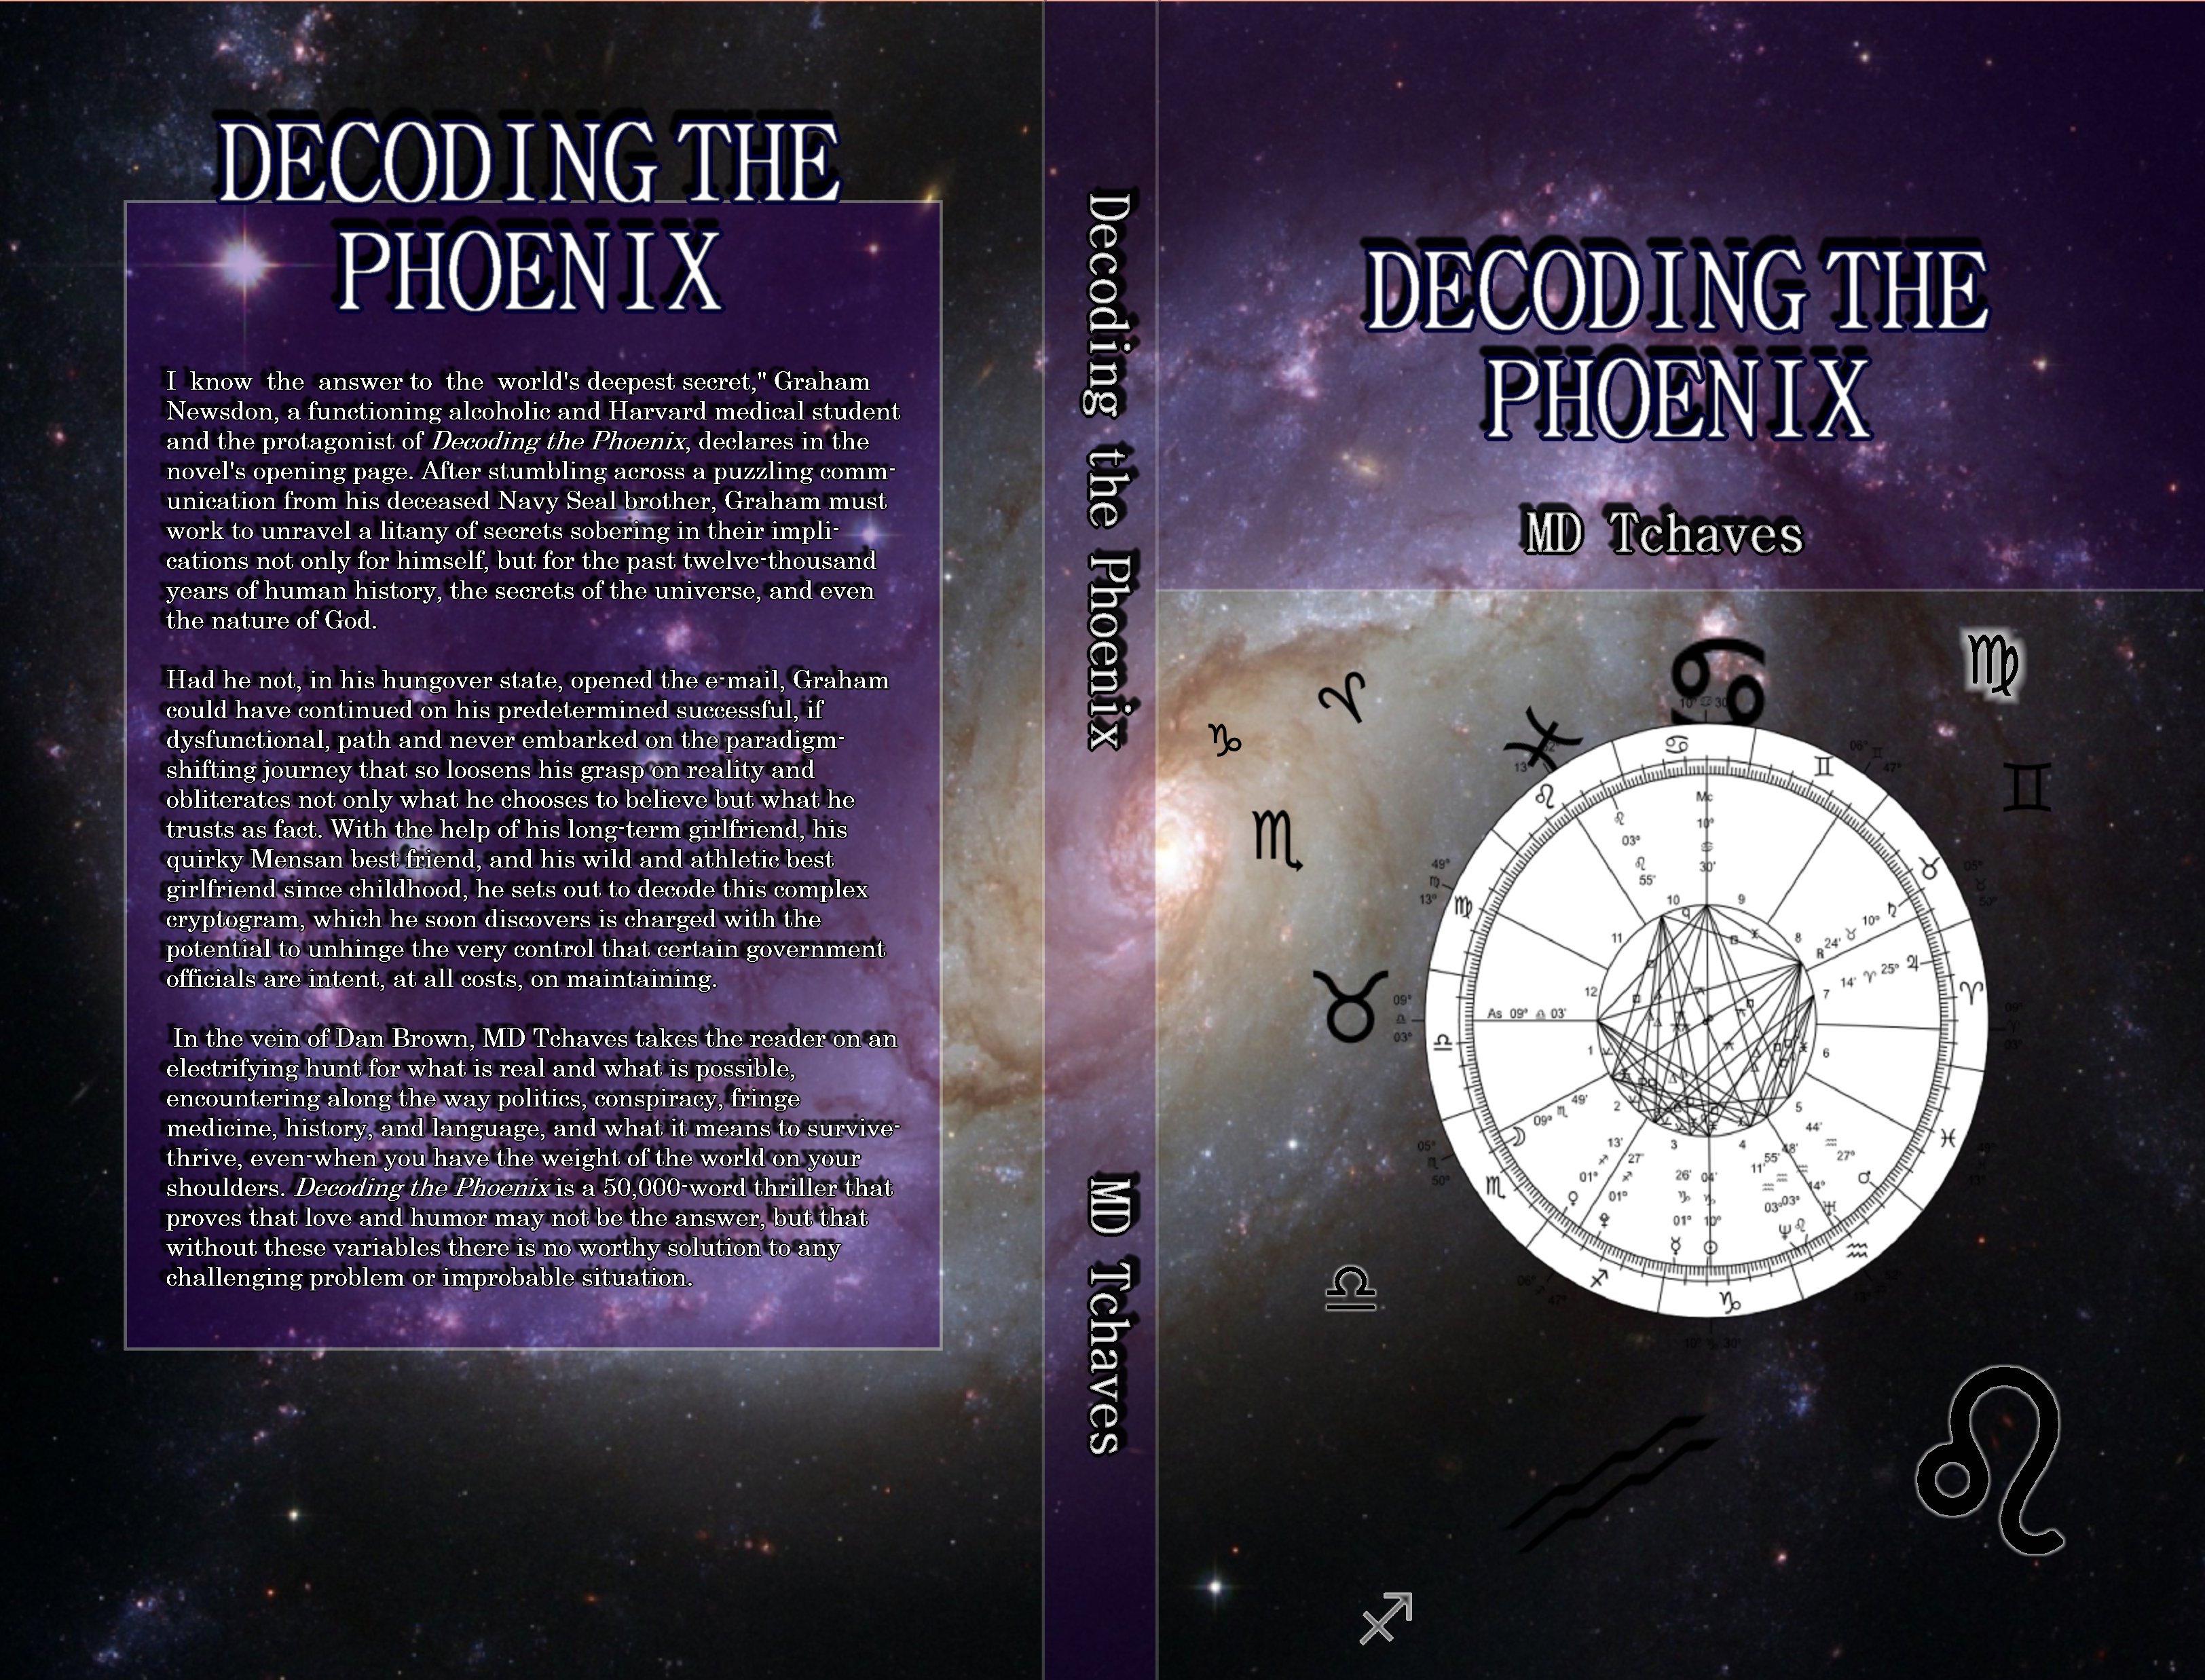 Astrology inspires thriller trilogy novel for Long Island native author